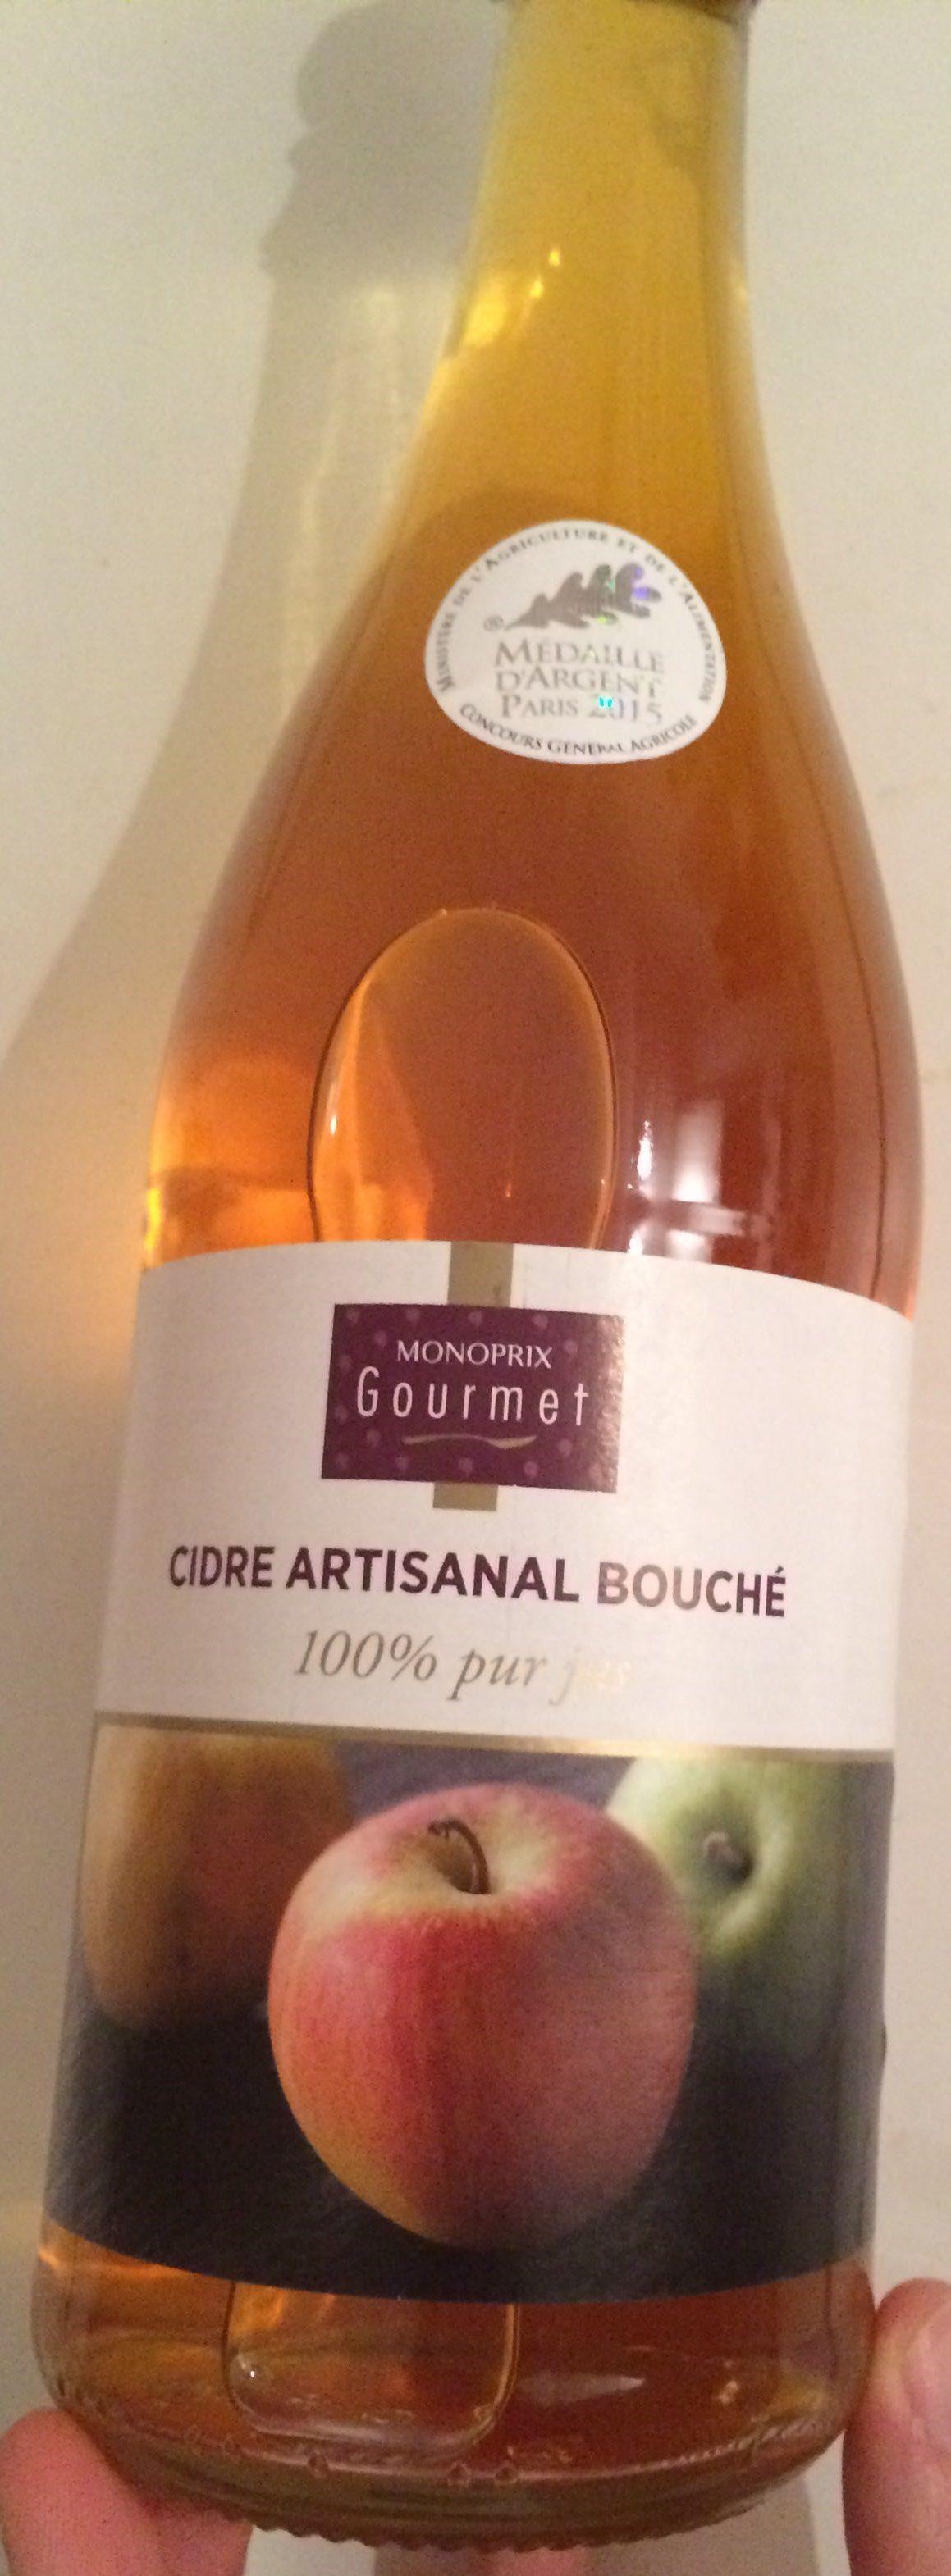 Cidre Artisanal Bouché - Product